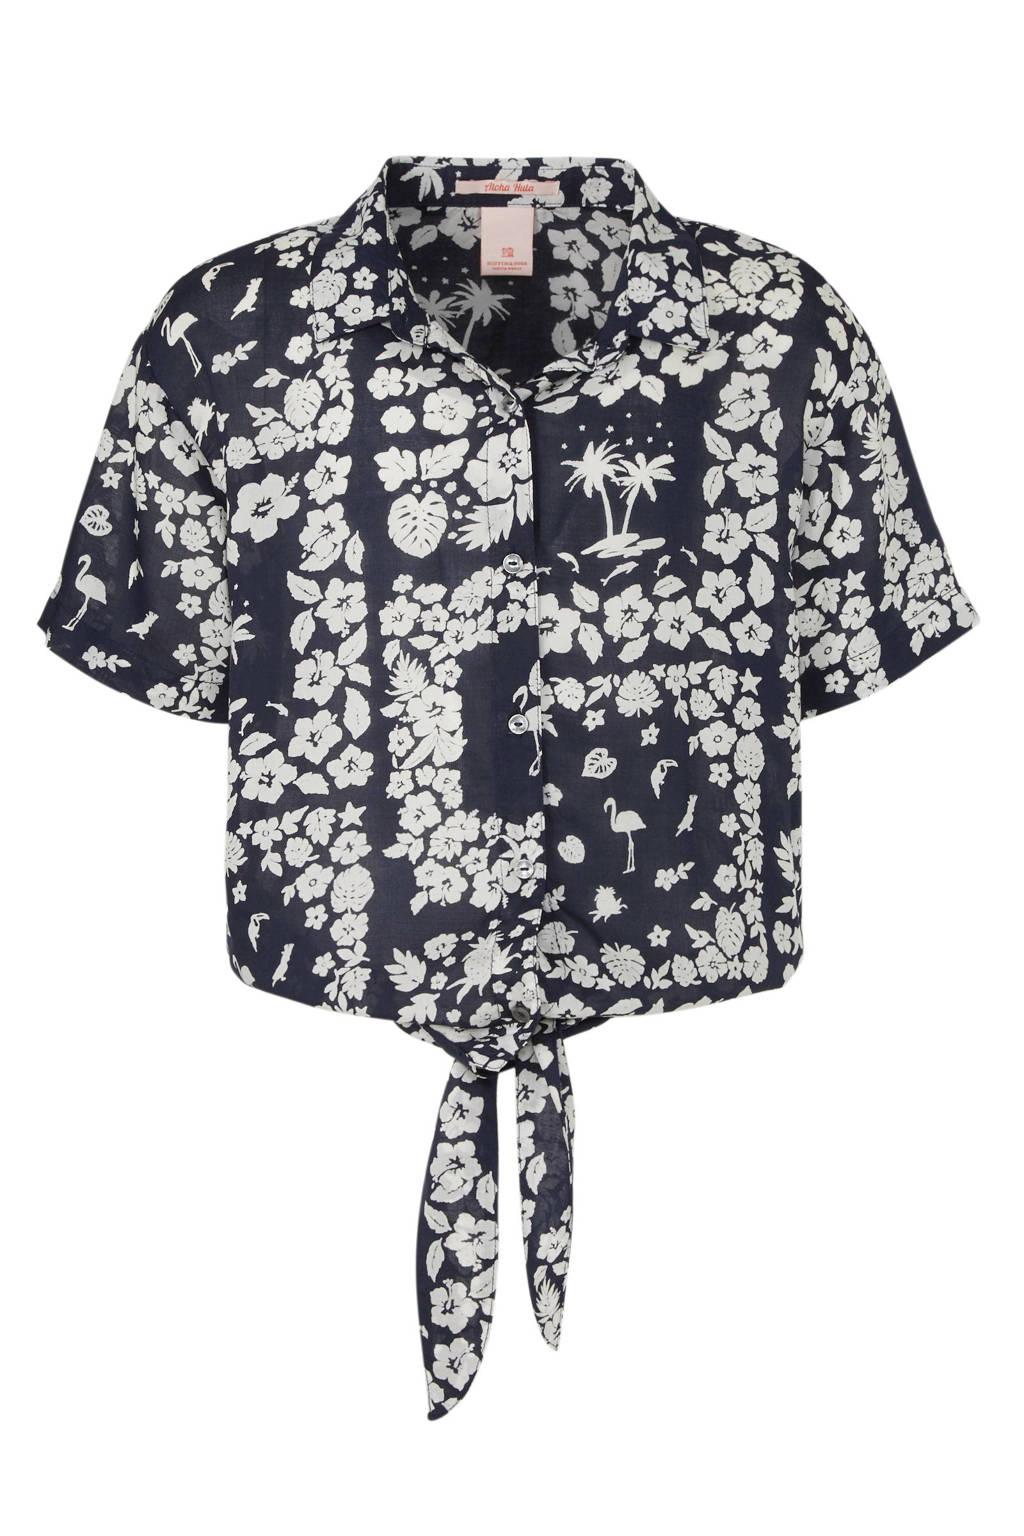 Scotch & Soda blouse met all over print donkerblauw/ecru, Donkerblauw/ecru